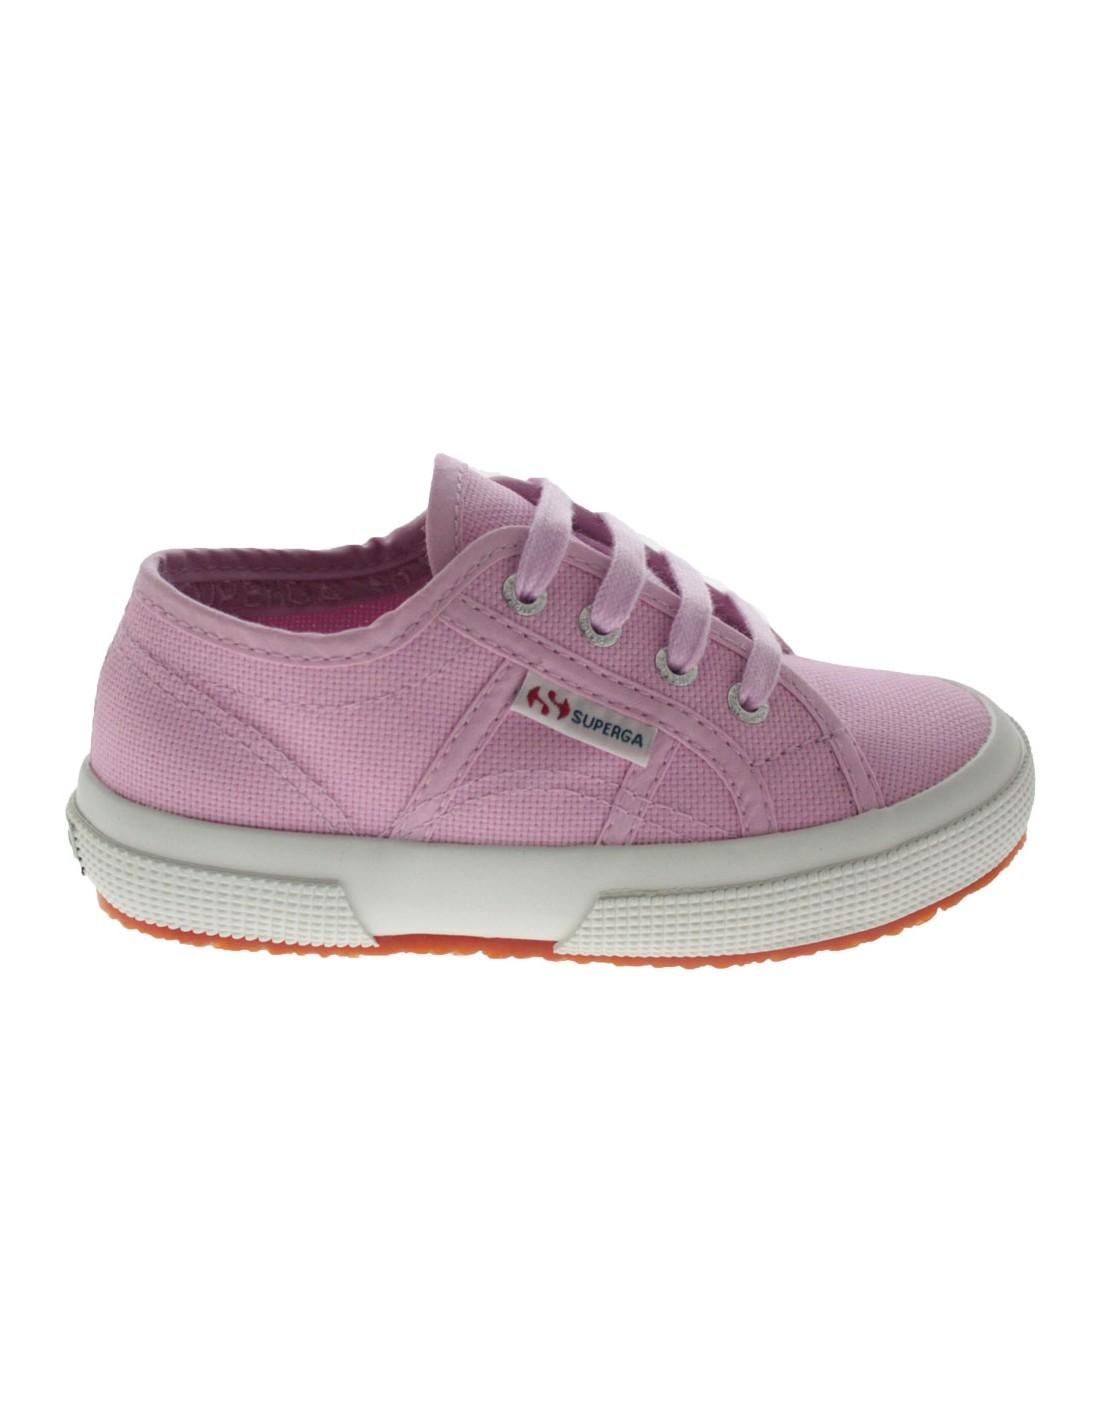 separation shoes 98353 98a21 Scarpe Superga 2750 Classic bambina rosa